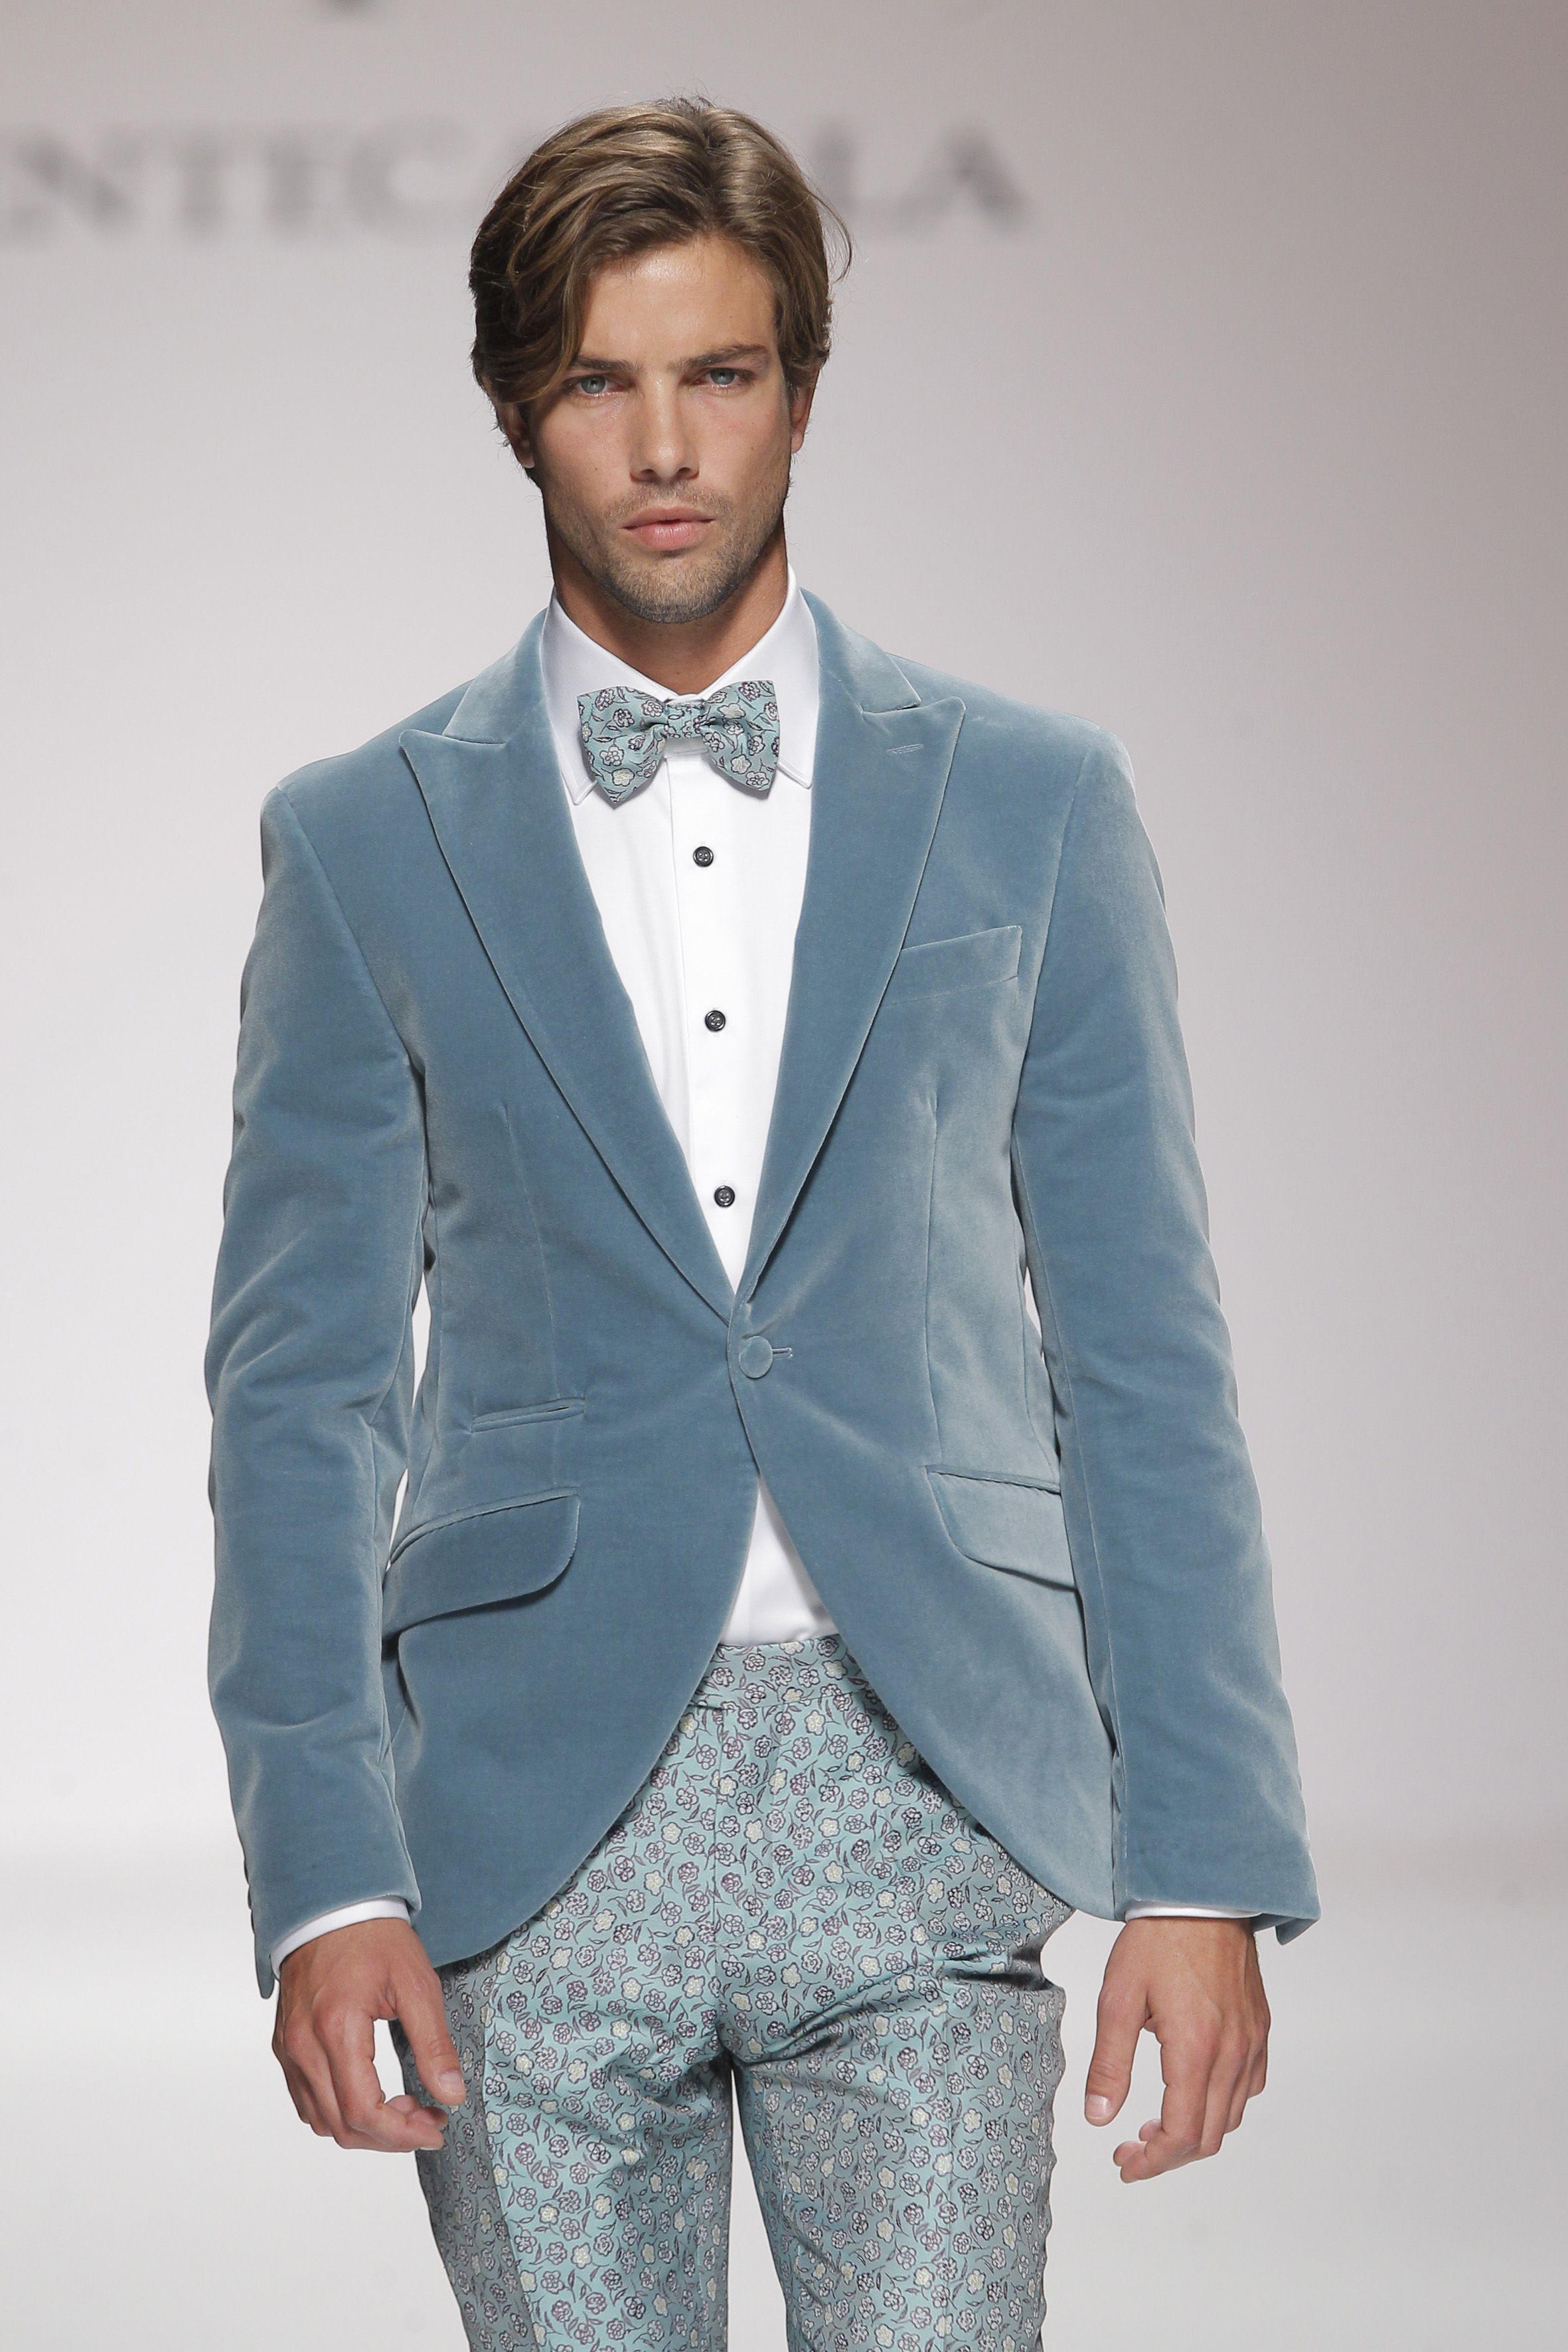 Outstanding Cool Groom Suits Pattern - Wedding Dress Ideas ...